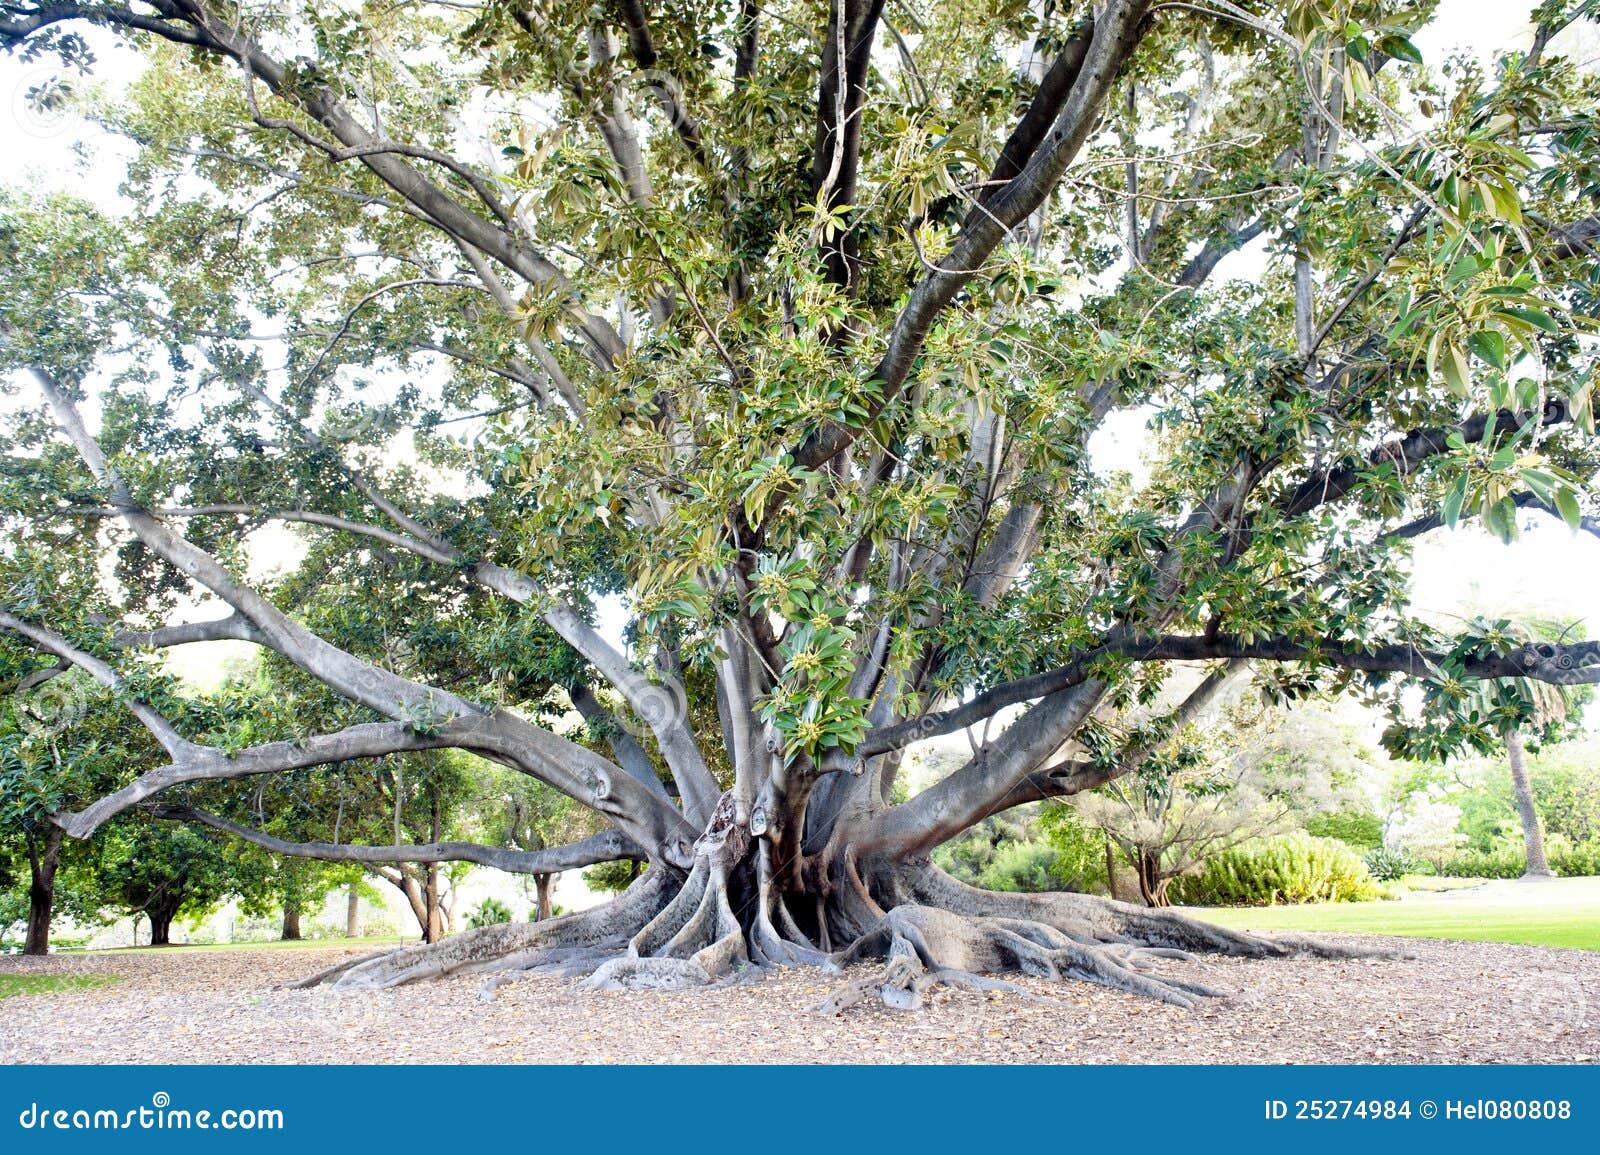 ficus park perth tree - Ficus Trees